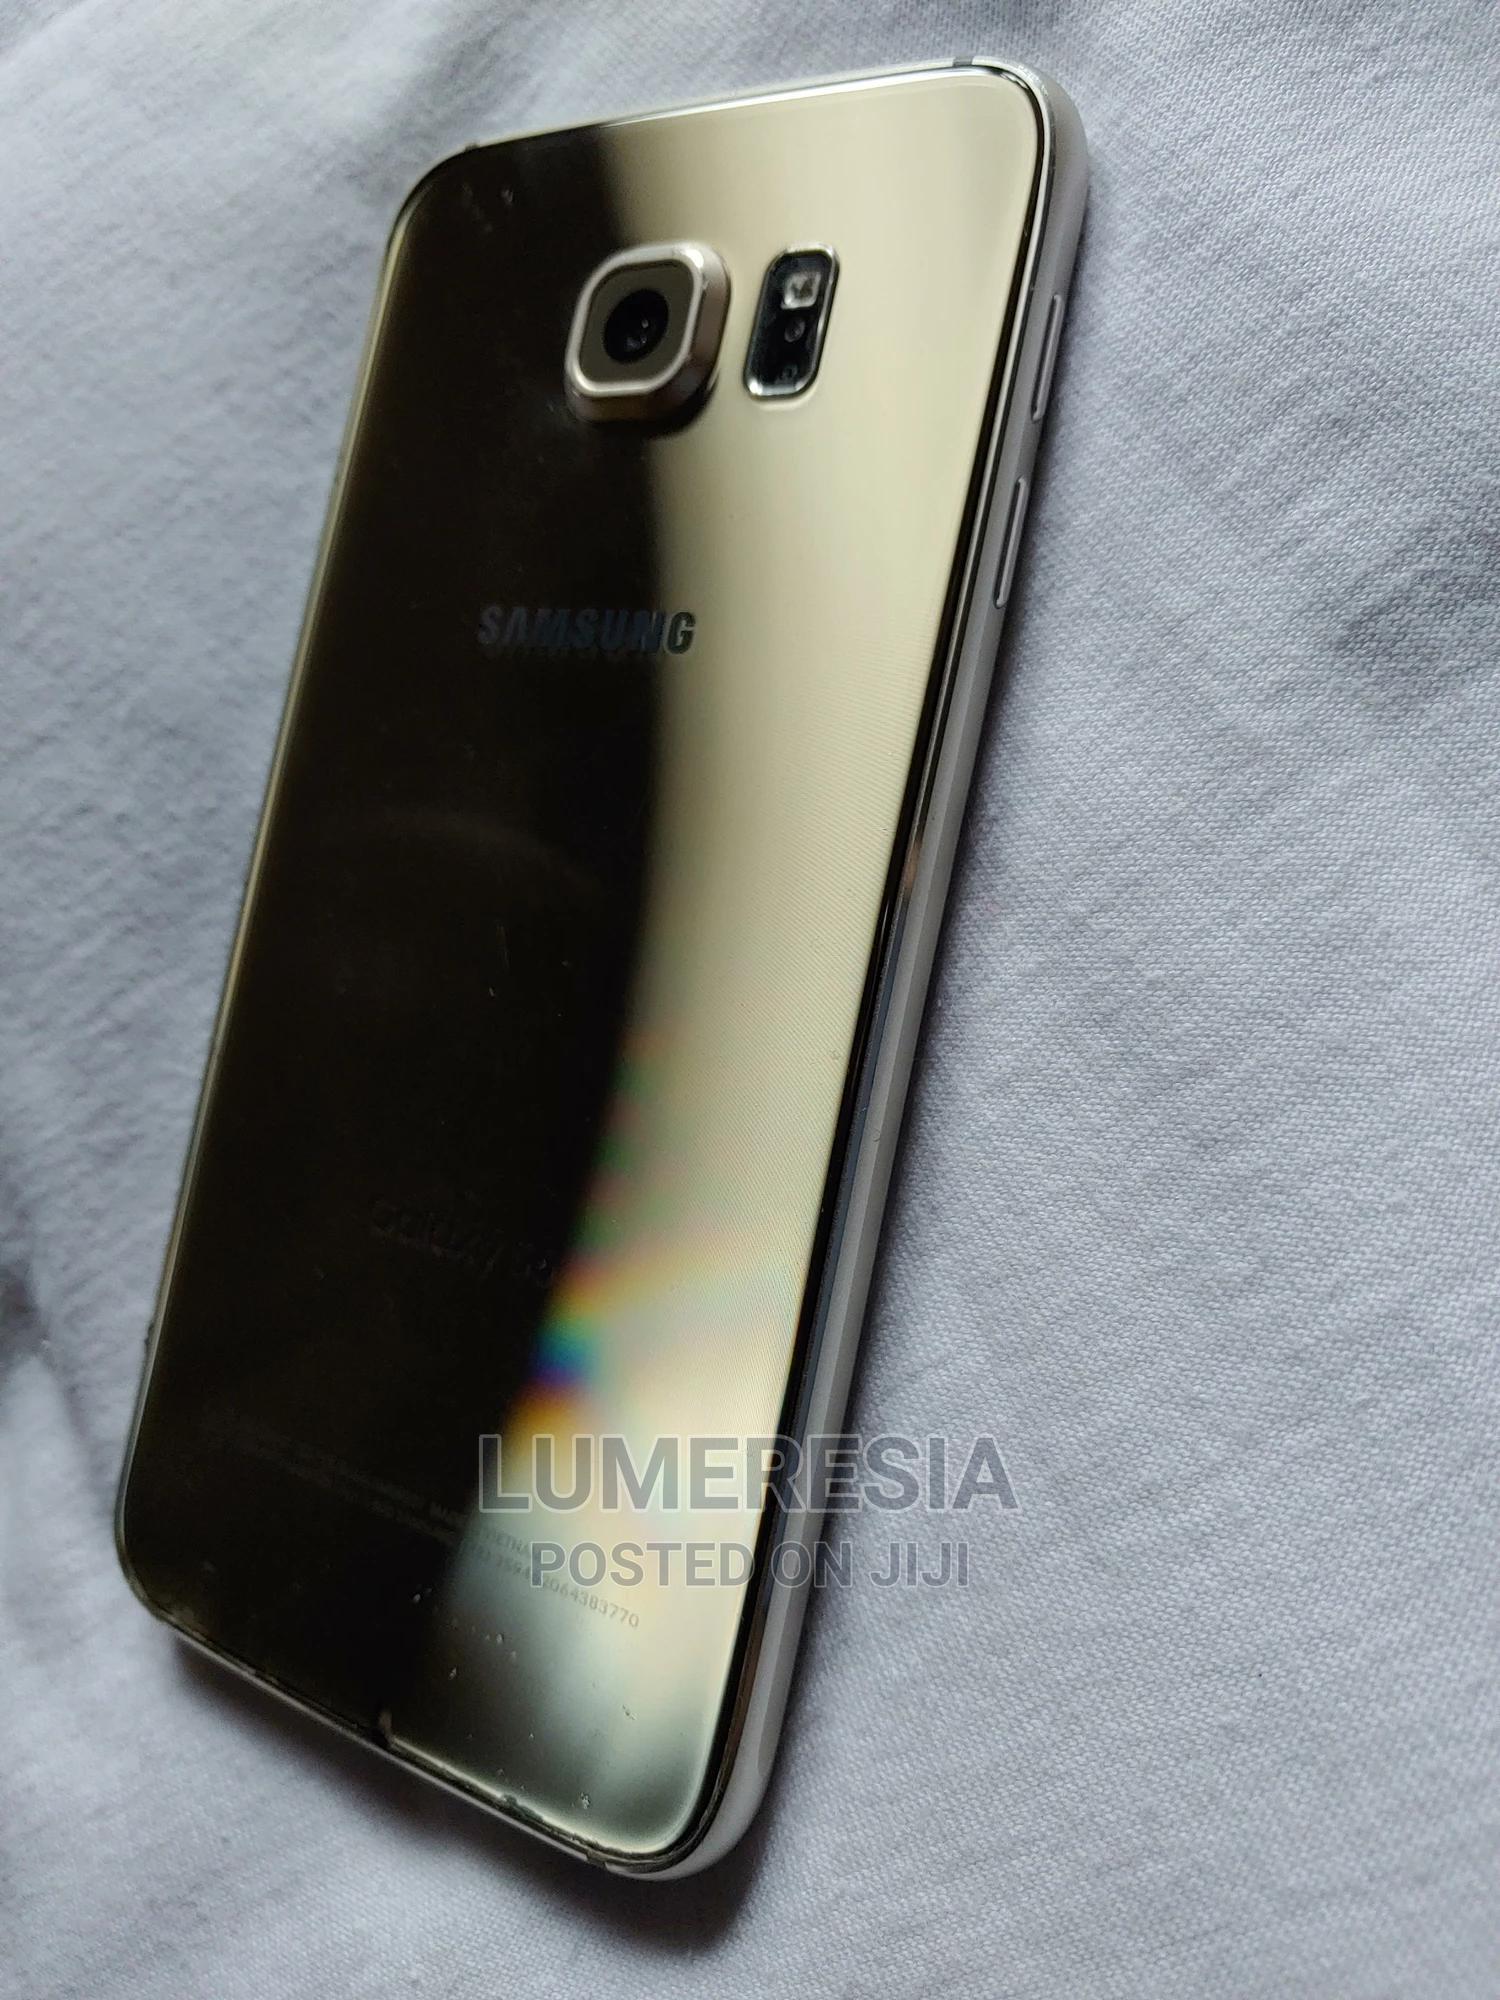 Samsung Galaxy S6 32 GB Gold | Mobile Phones for sale in Ilemela, Mwanza Region, Tanzania